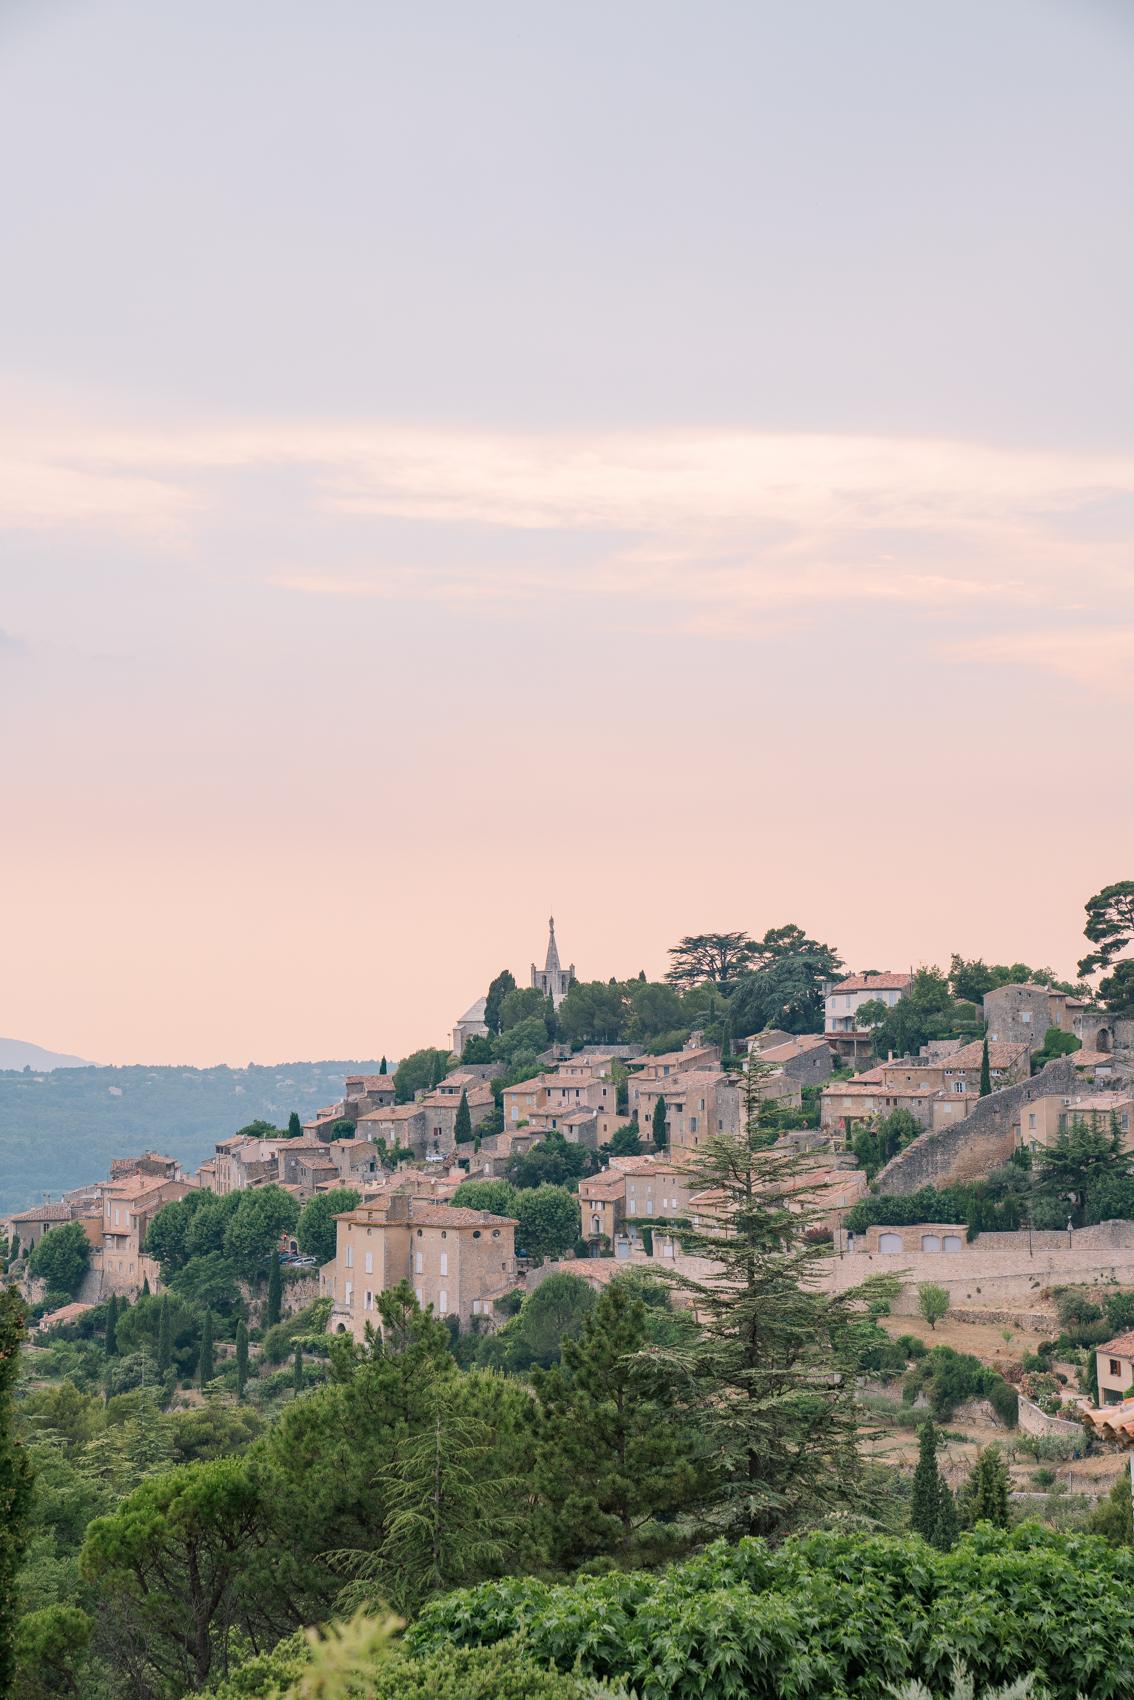 TRAVEL-Photography-provence-landscape-Bonnieux-Clara-Tuma.jpg